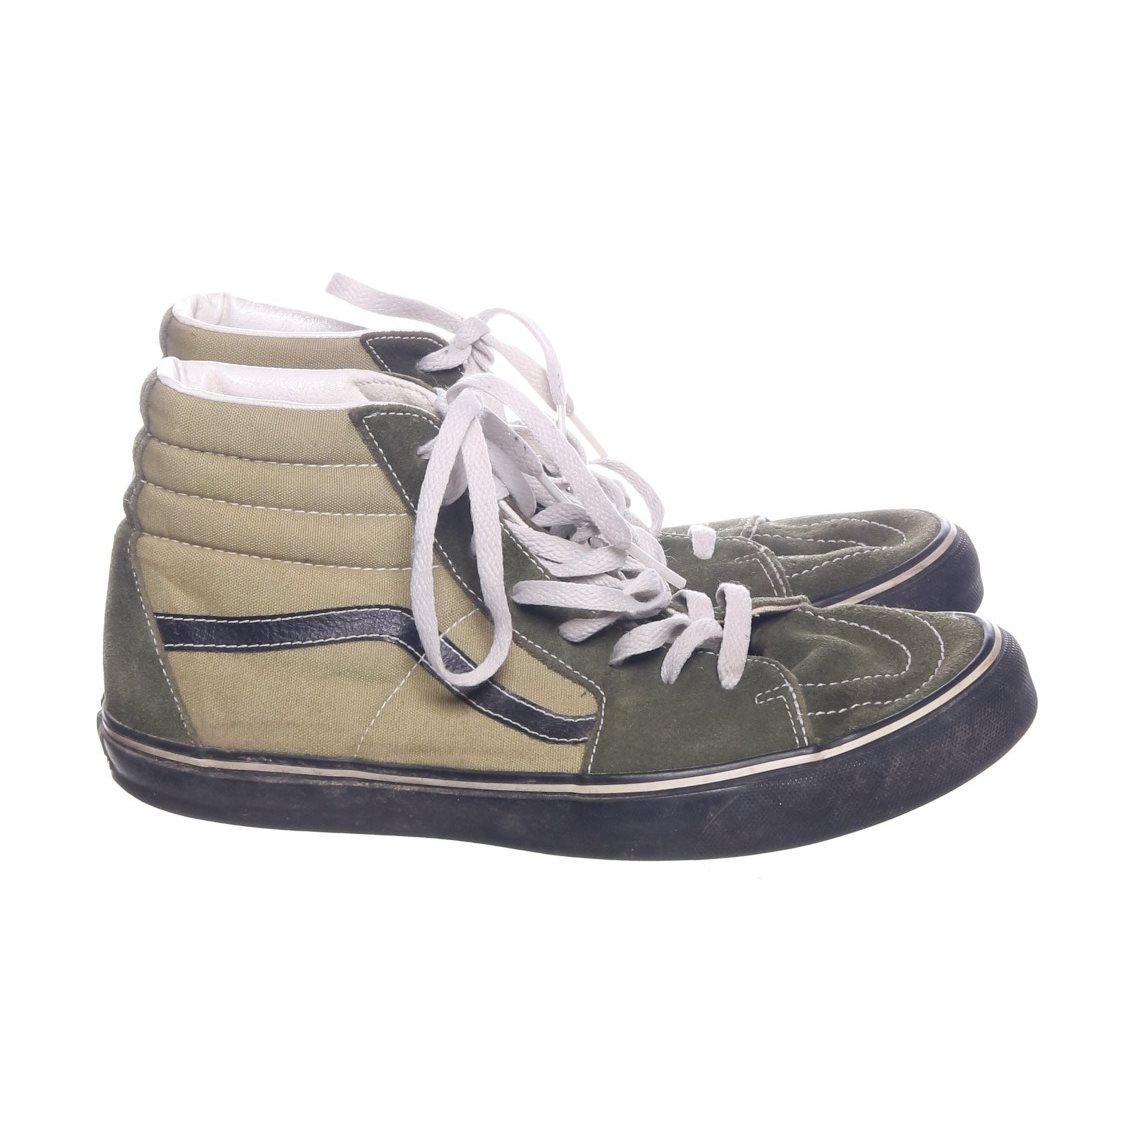 b1b6f449f56 Vans, Sneakers, Strl: 43, Grön (342053326) ᐈ Sellpy på Tradera